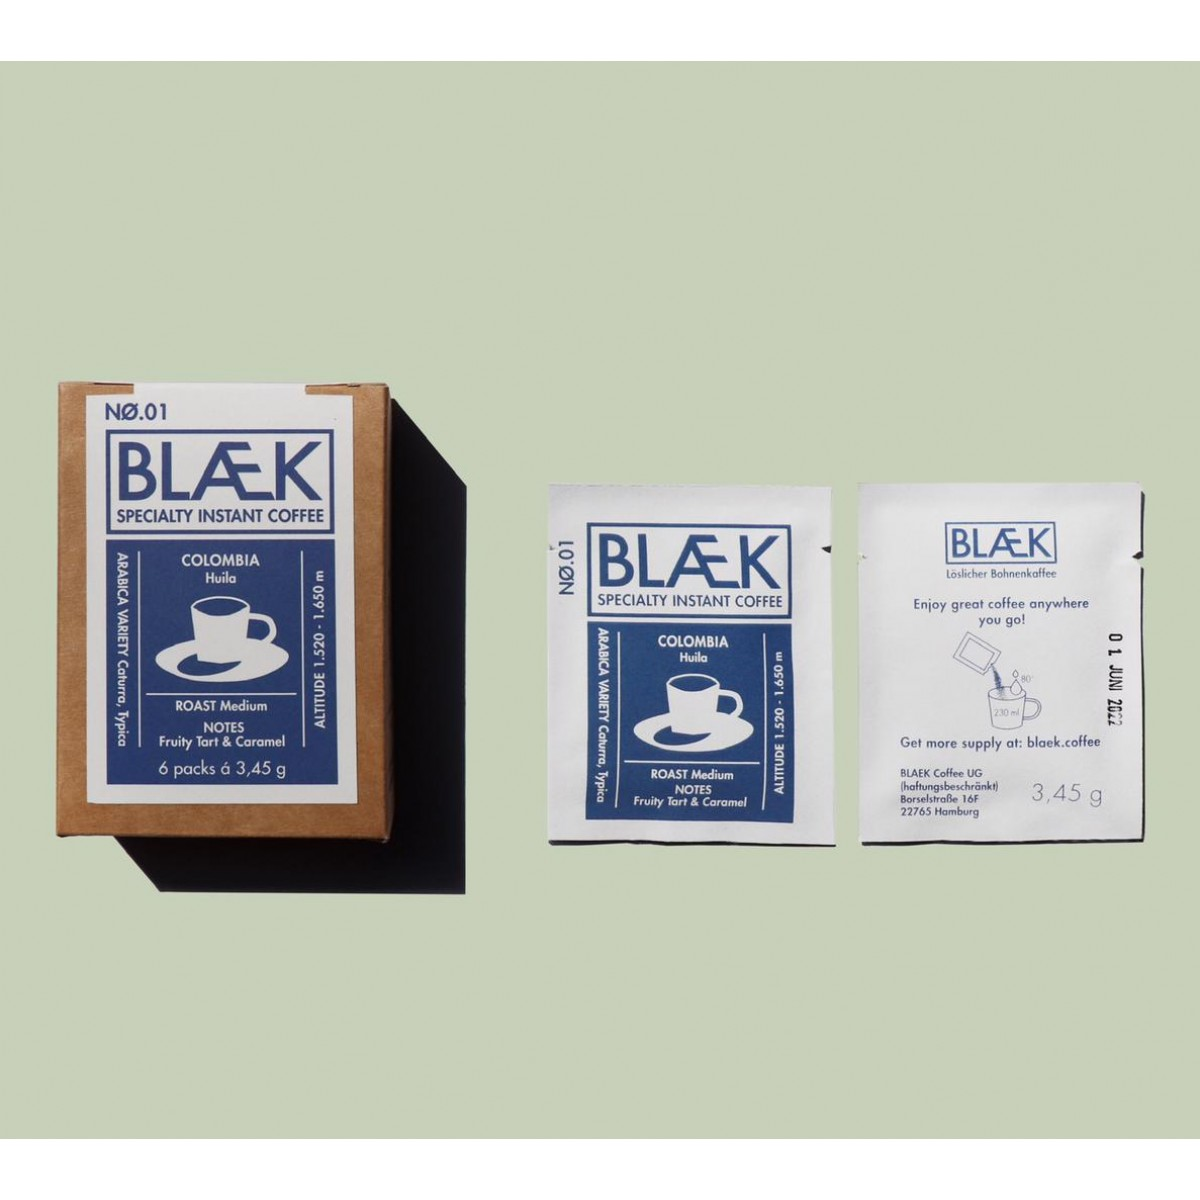 BLÆK - Specialty Instant Coffee NØ.1 (1 Box mit 6 Sachets)